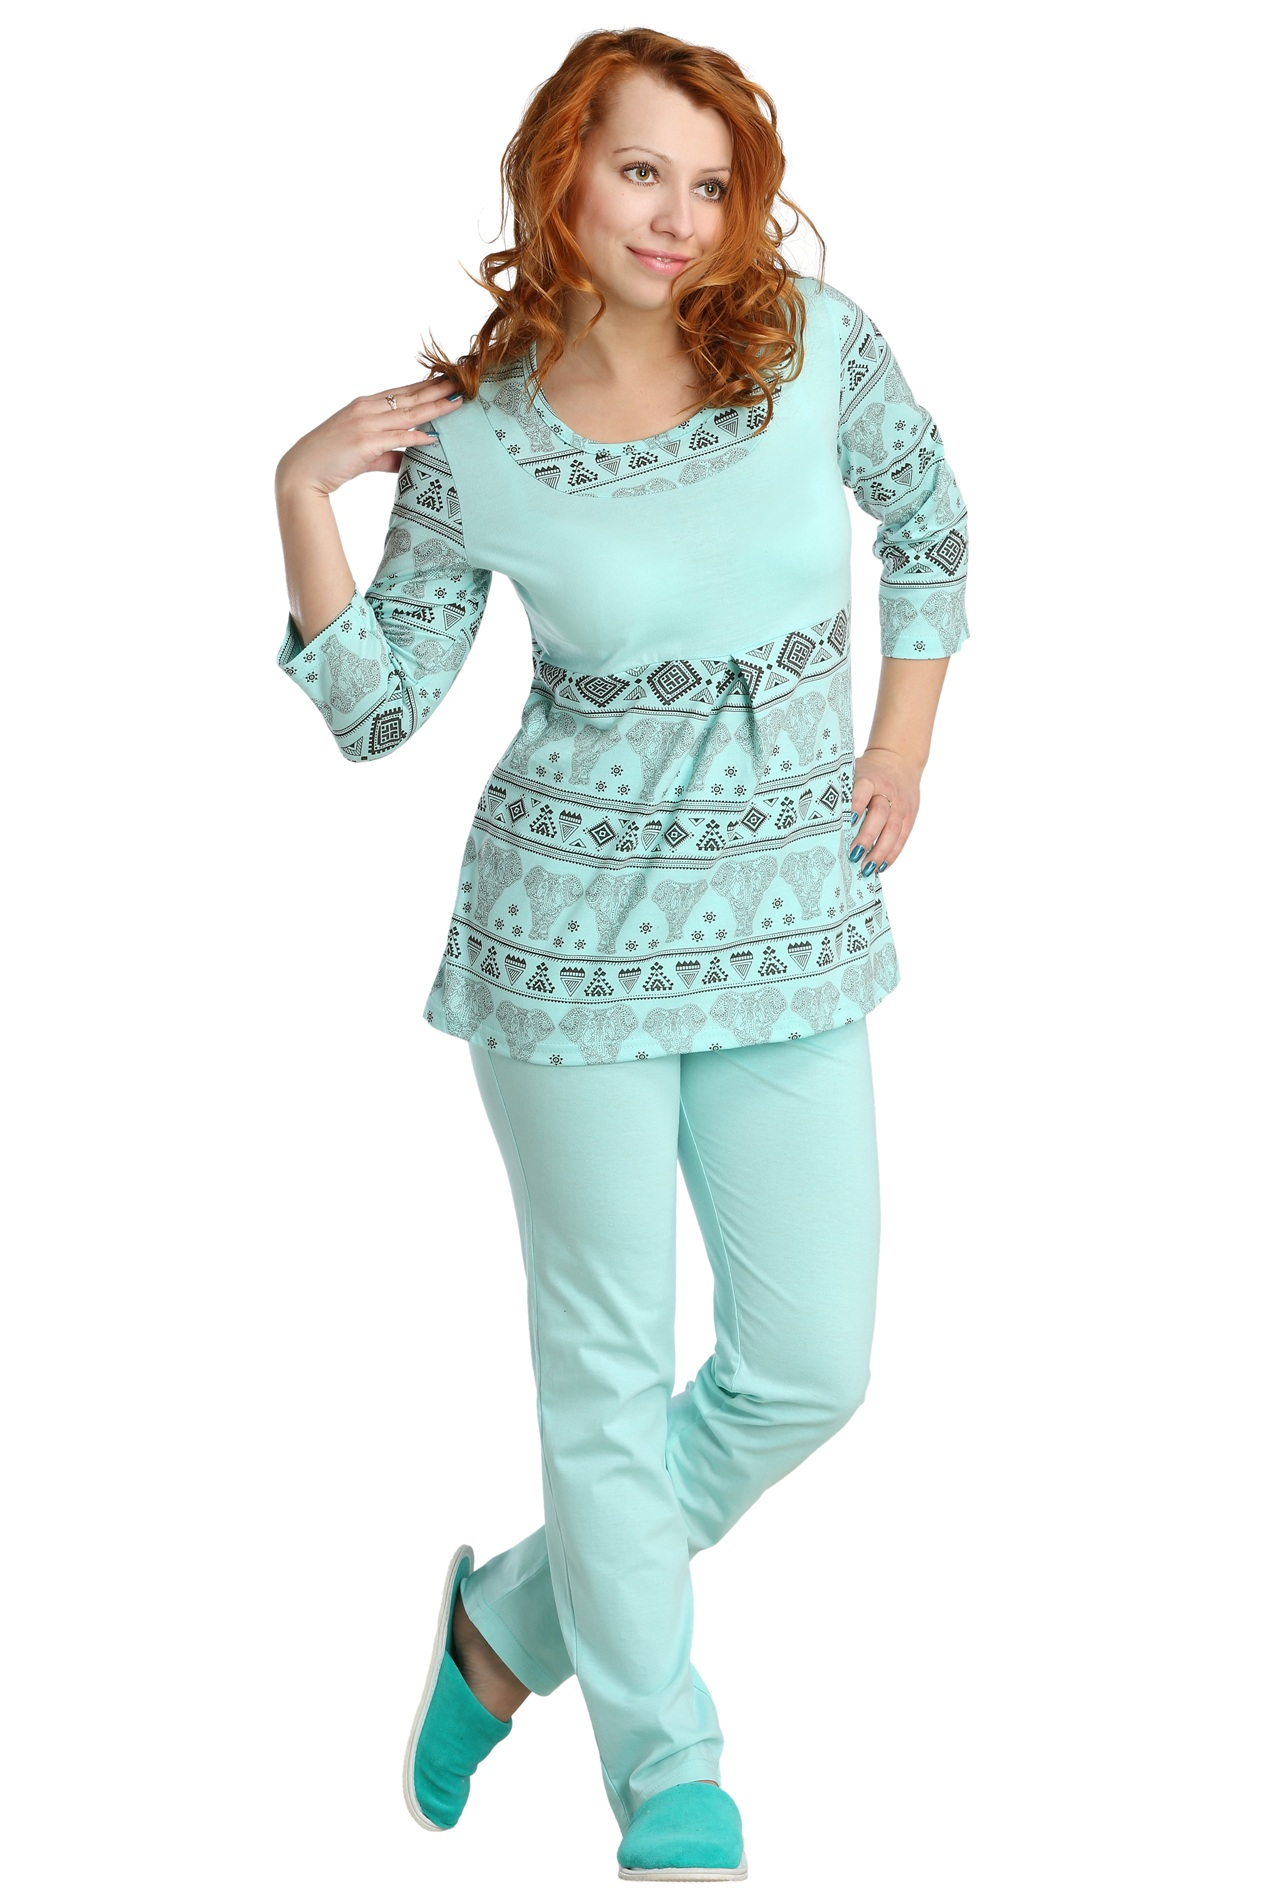 Жен. пижама арт. 16-0087 Ментол р. 44 - Женская одежда артикул: 21985